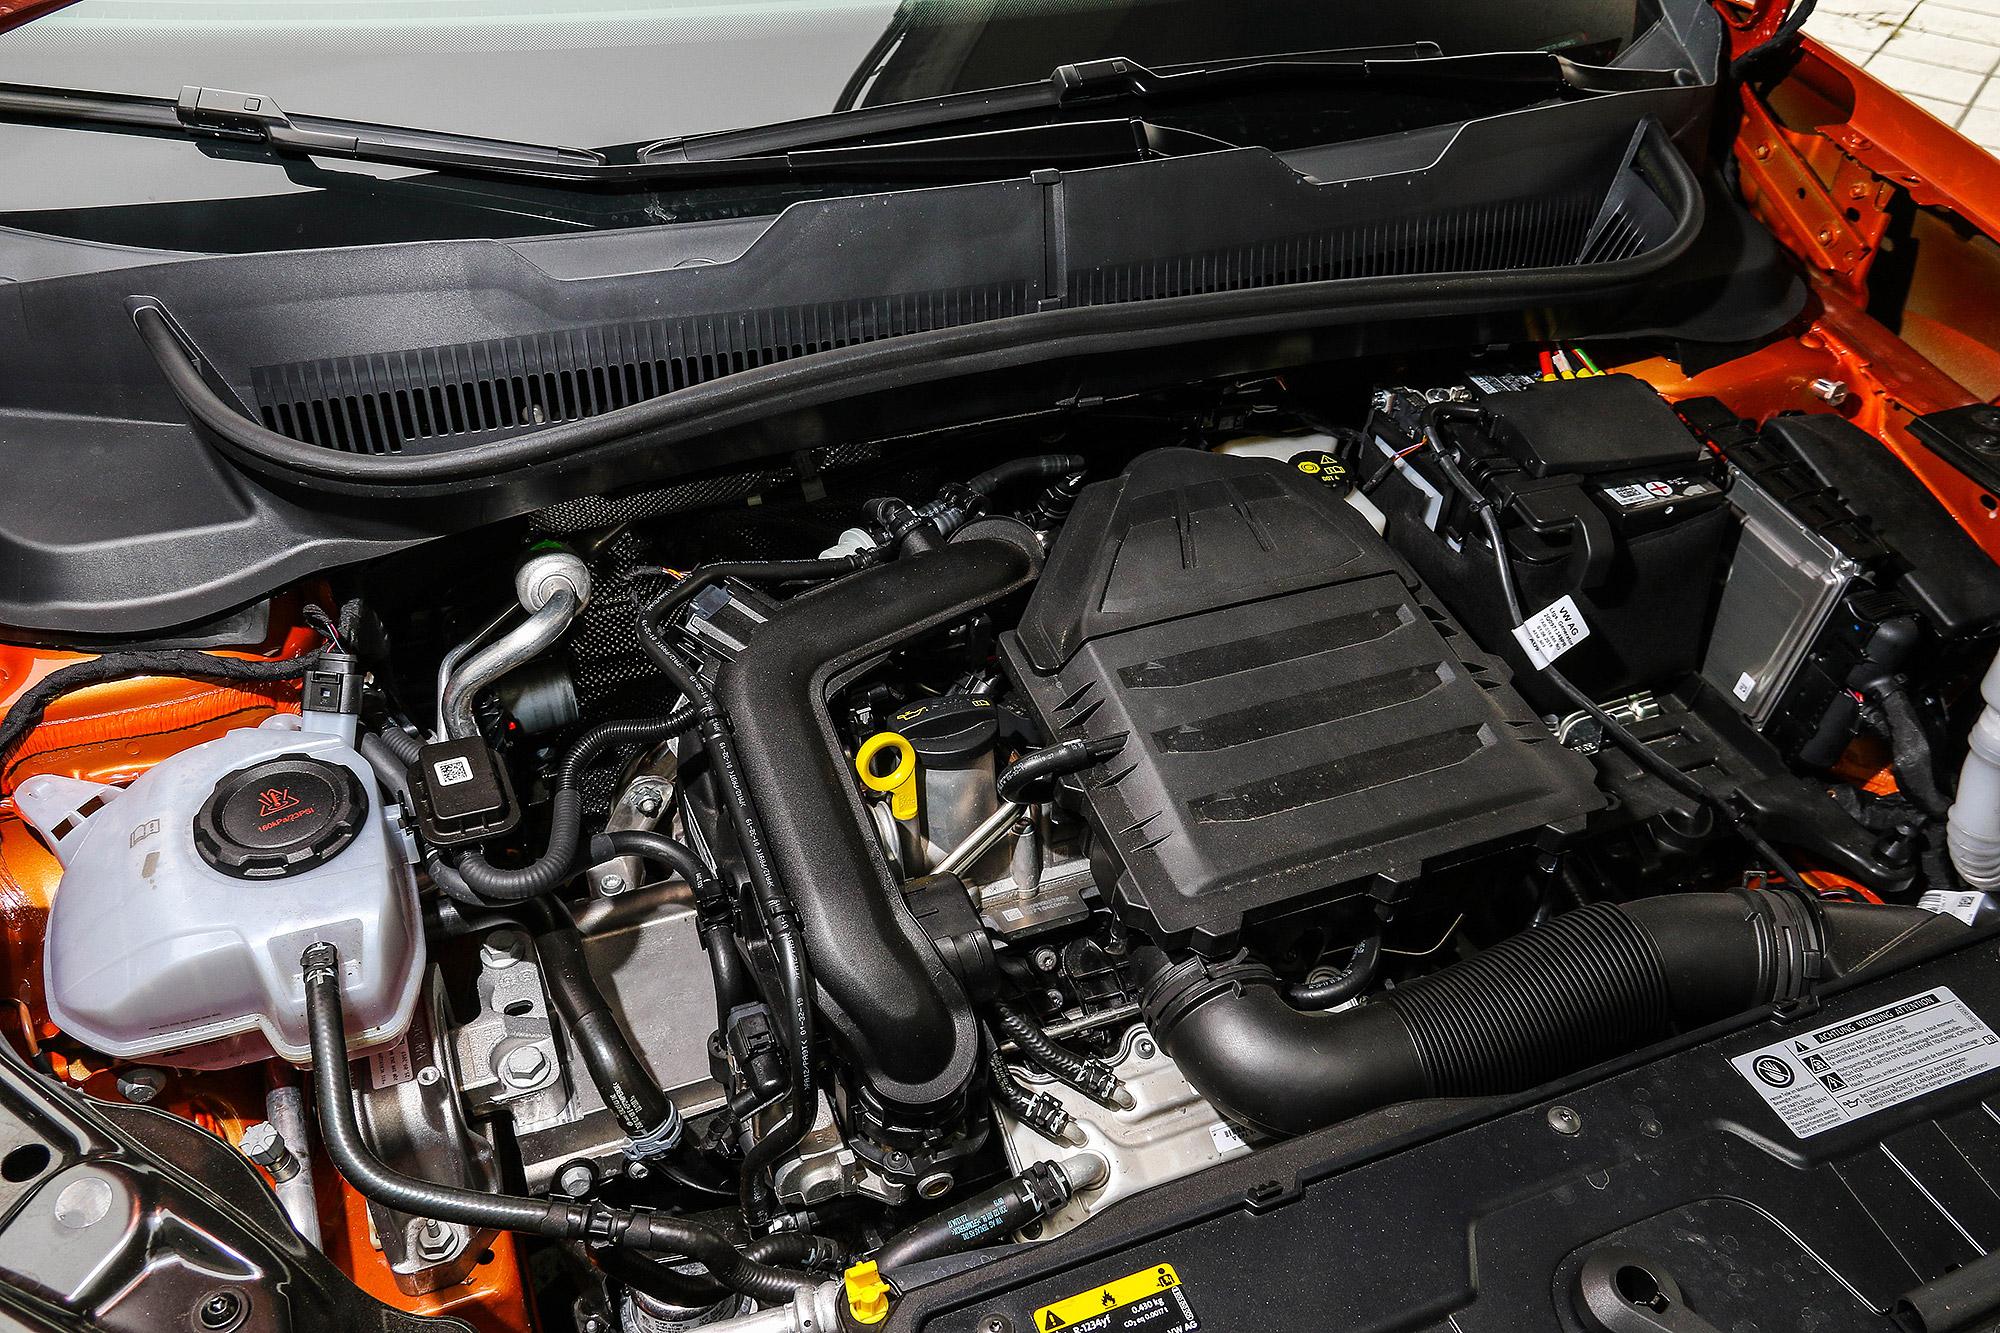 1.0 TSI 引擎具有 115 匹馬力與 20.4 公斤扭力輸出。